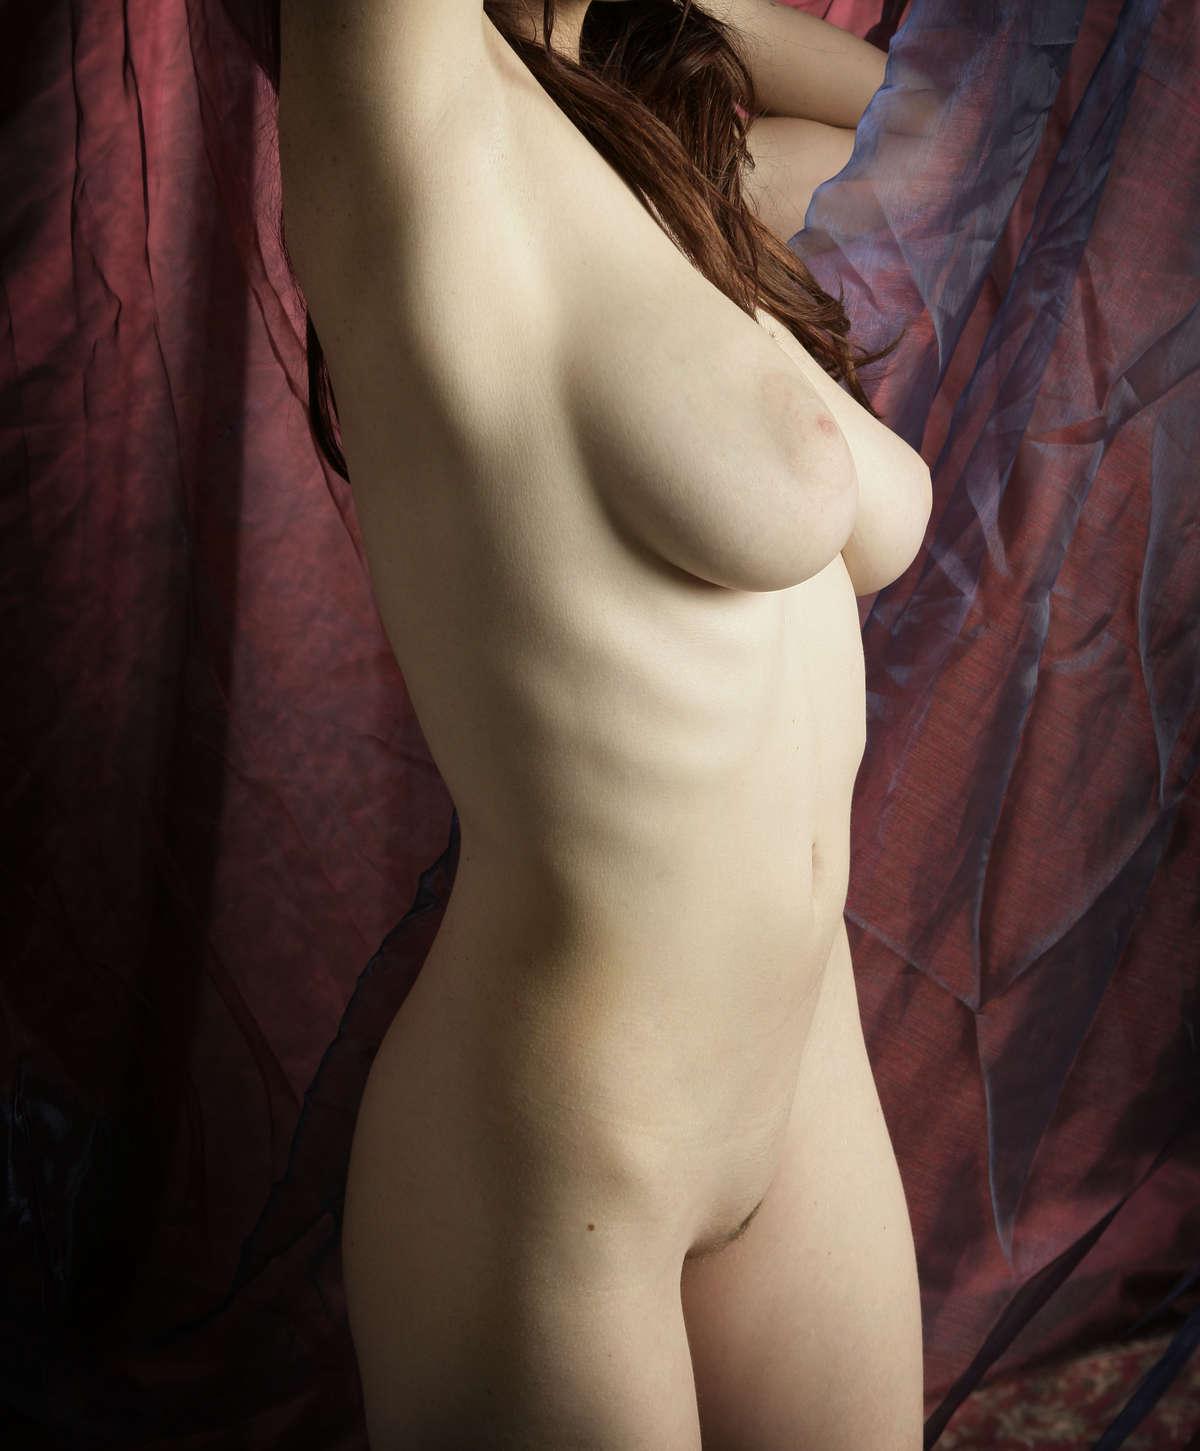 Were crystal vang nude photos